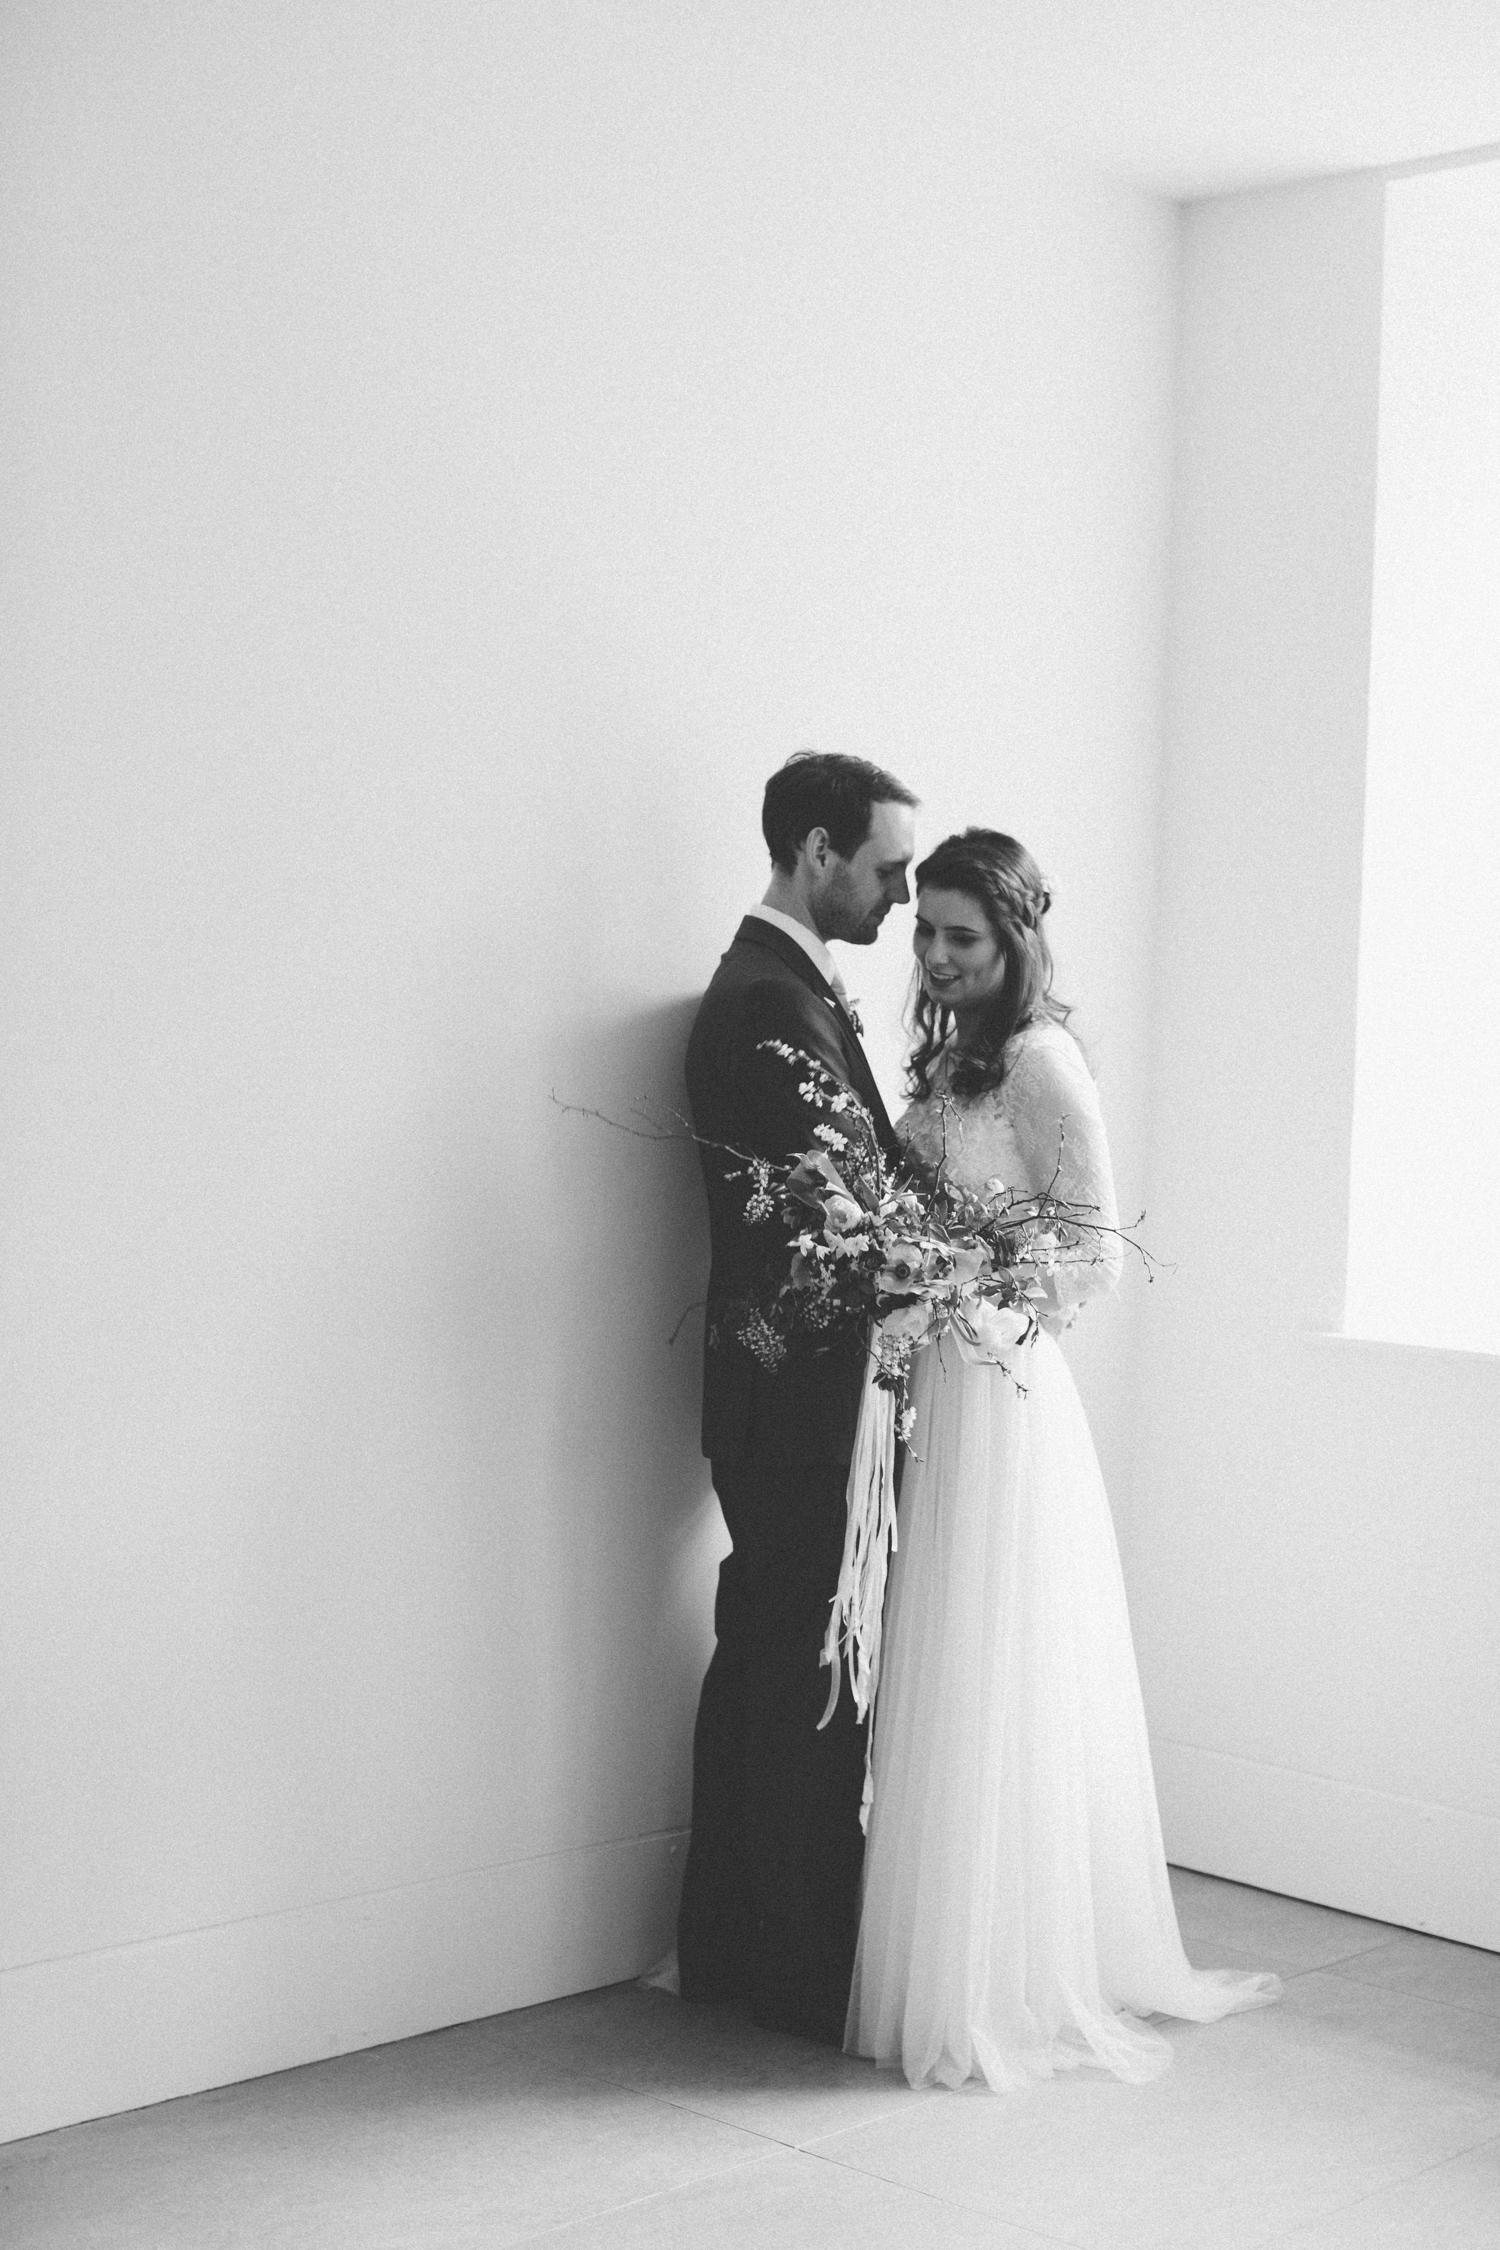 Quirky Wedding Photography Edinburgh Dovecot Studios 072.jpg